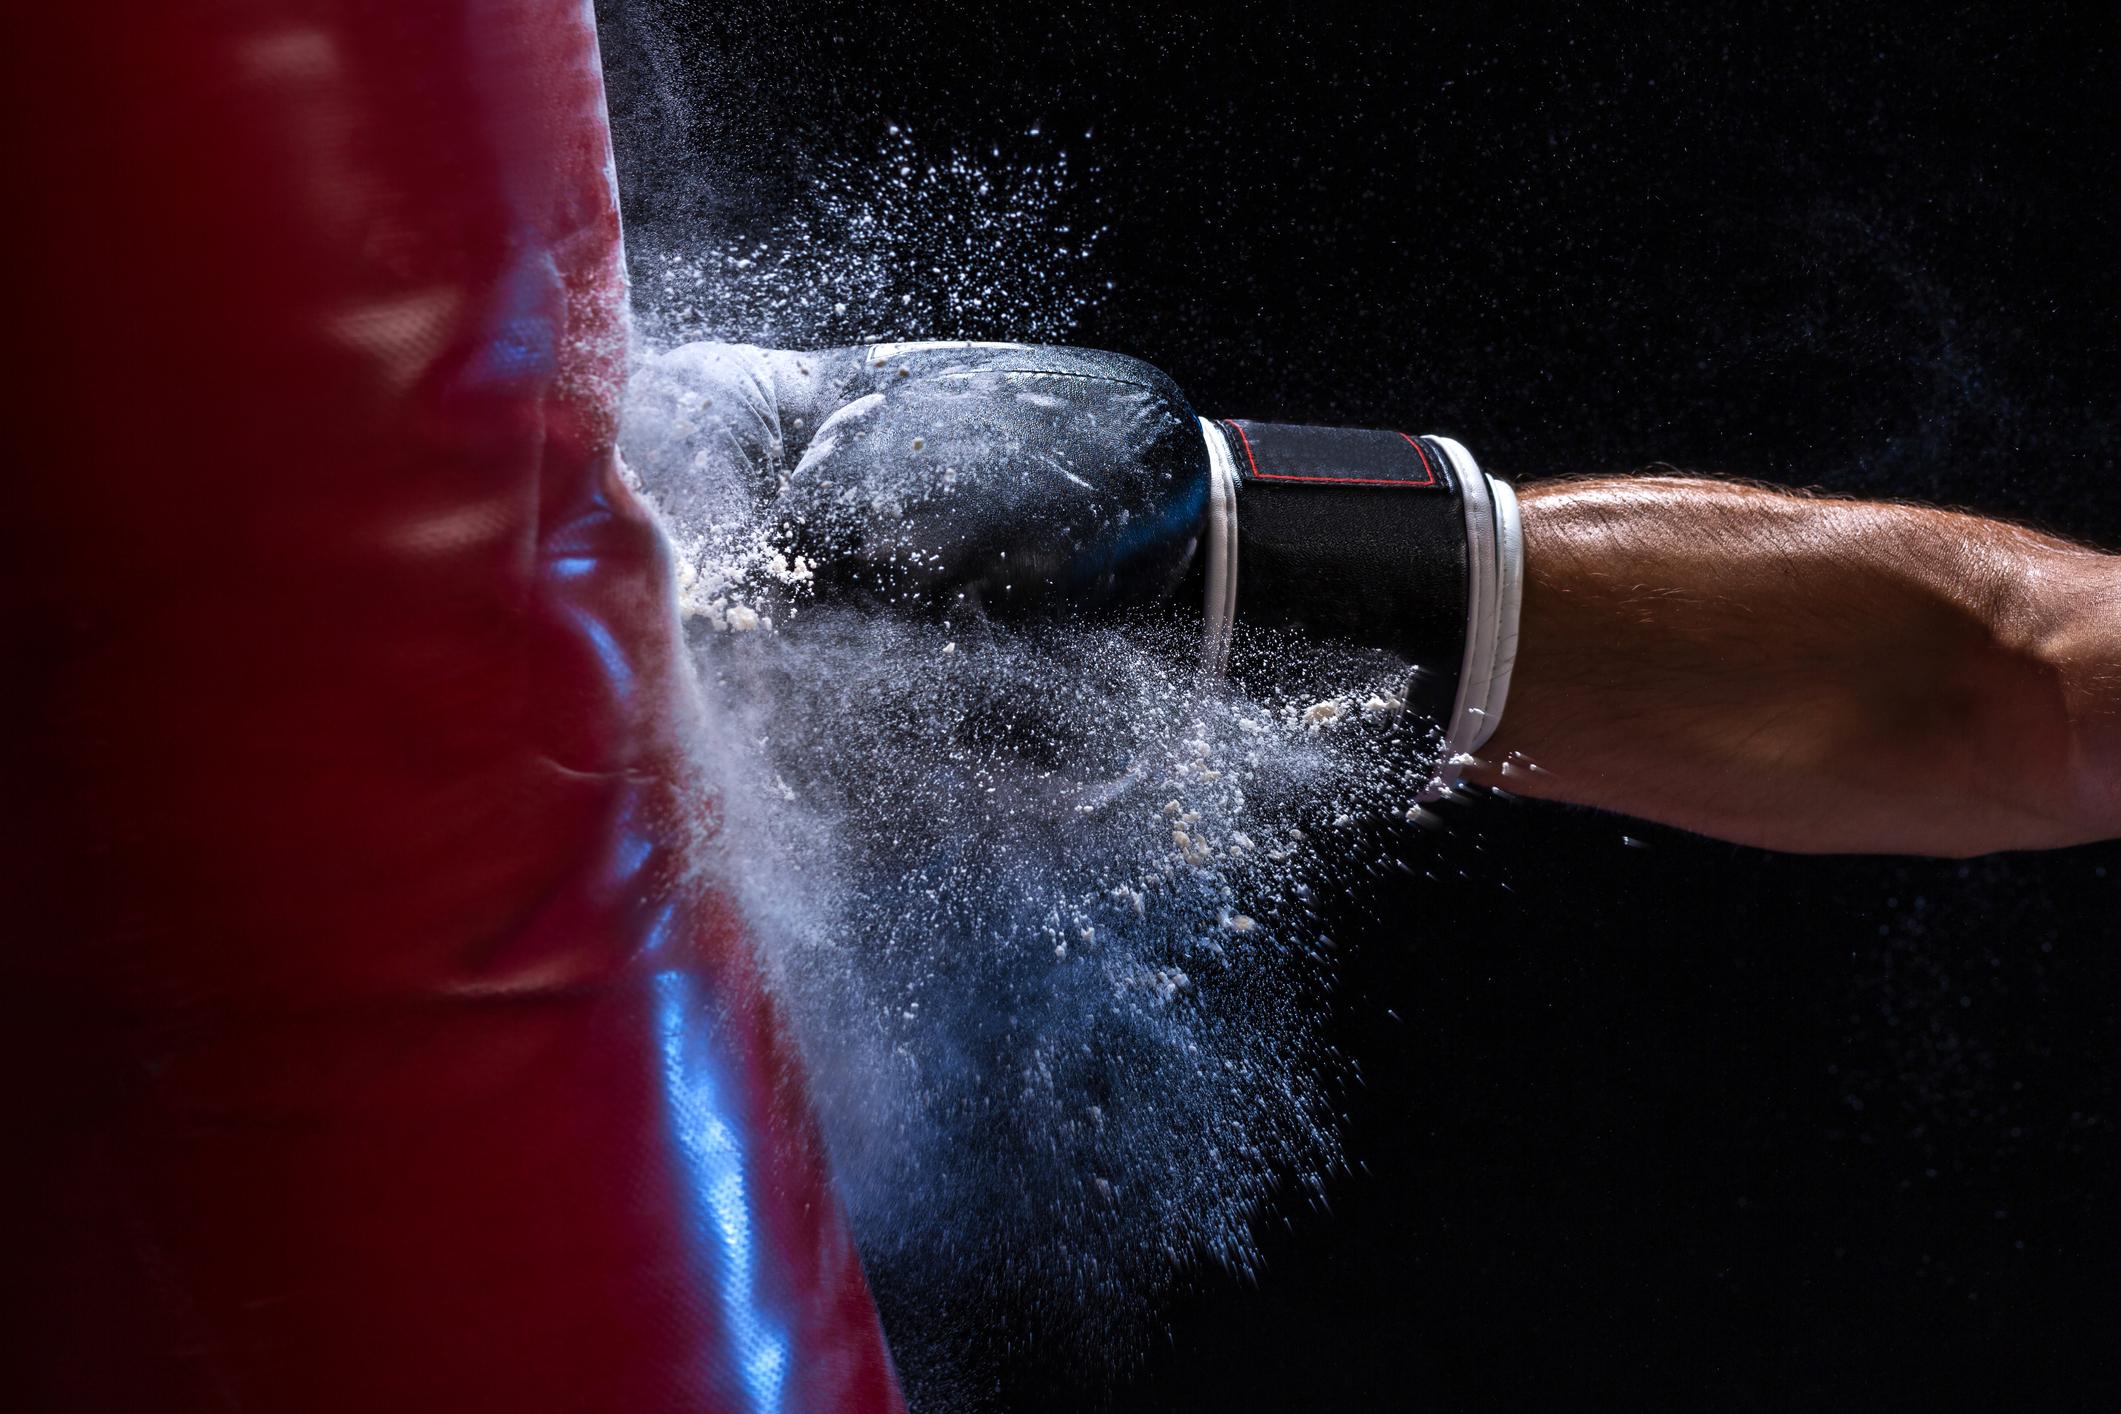 A boxer punching a bag